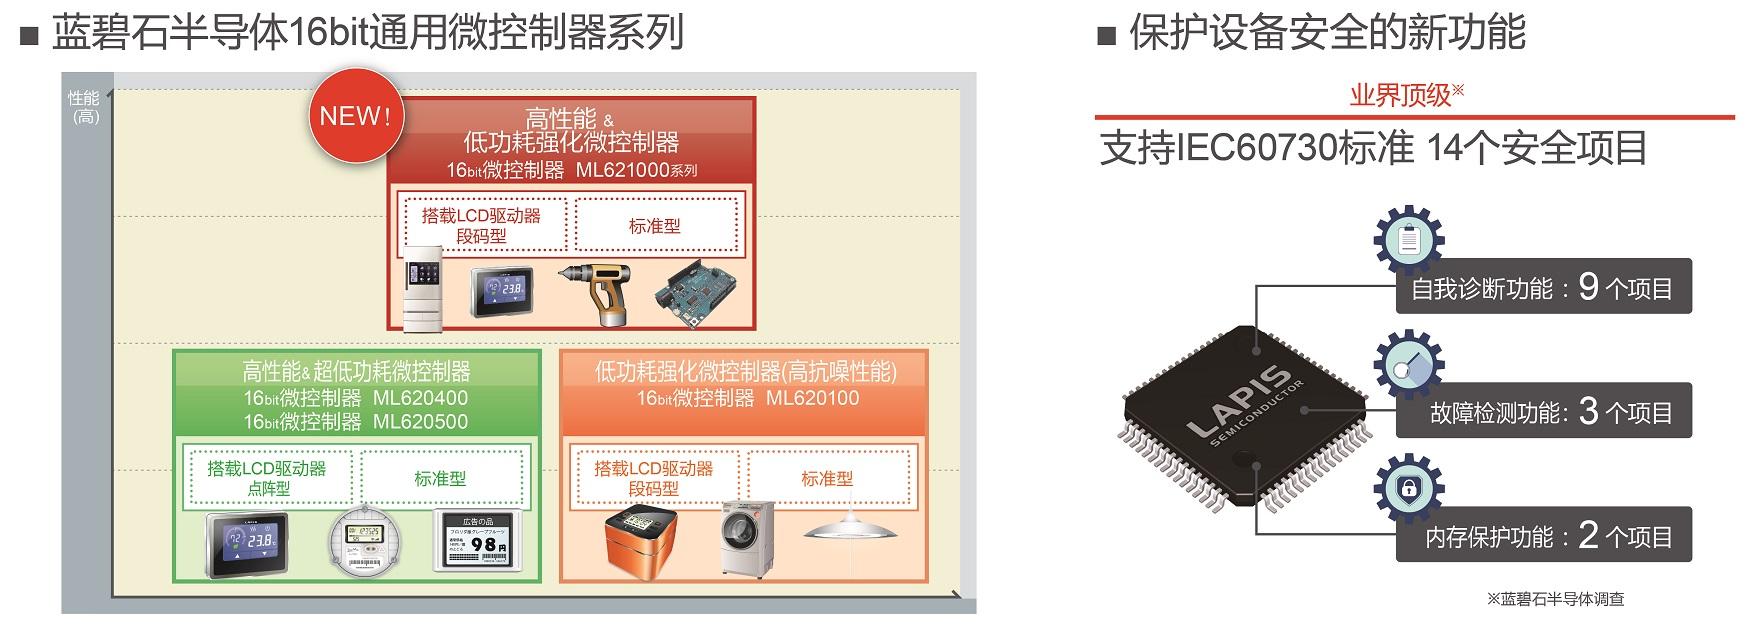 "ROHM旗下蓝碧石半导体开发出非常适用于家电和工业设备的 业界顶级""低功耗&强化&安全""16bit通用微控制器""ML62Q1000系列"""